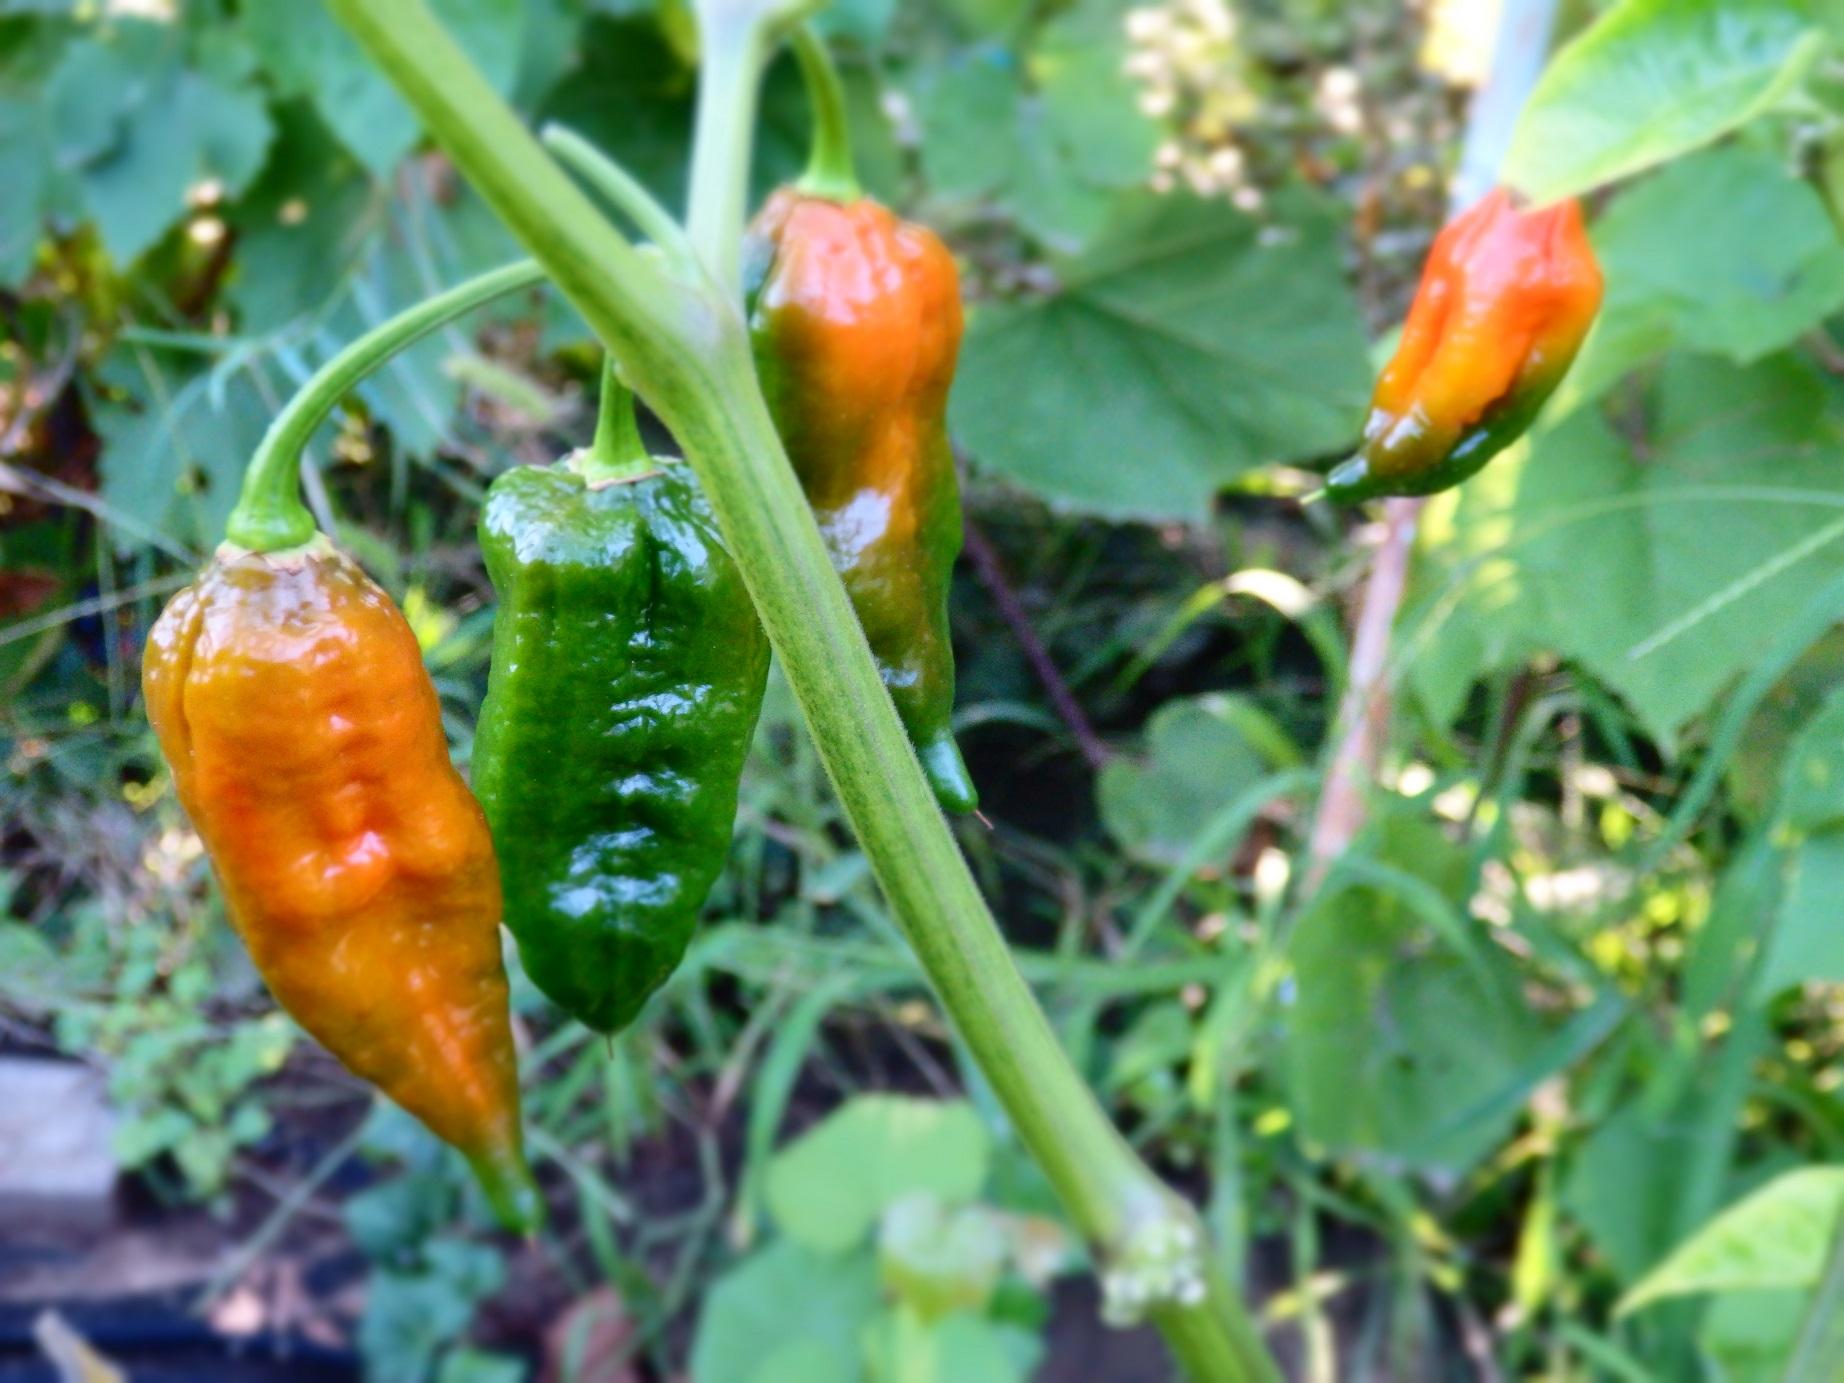 bhut jolokia ghost chili